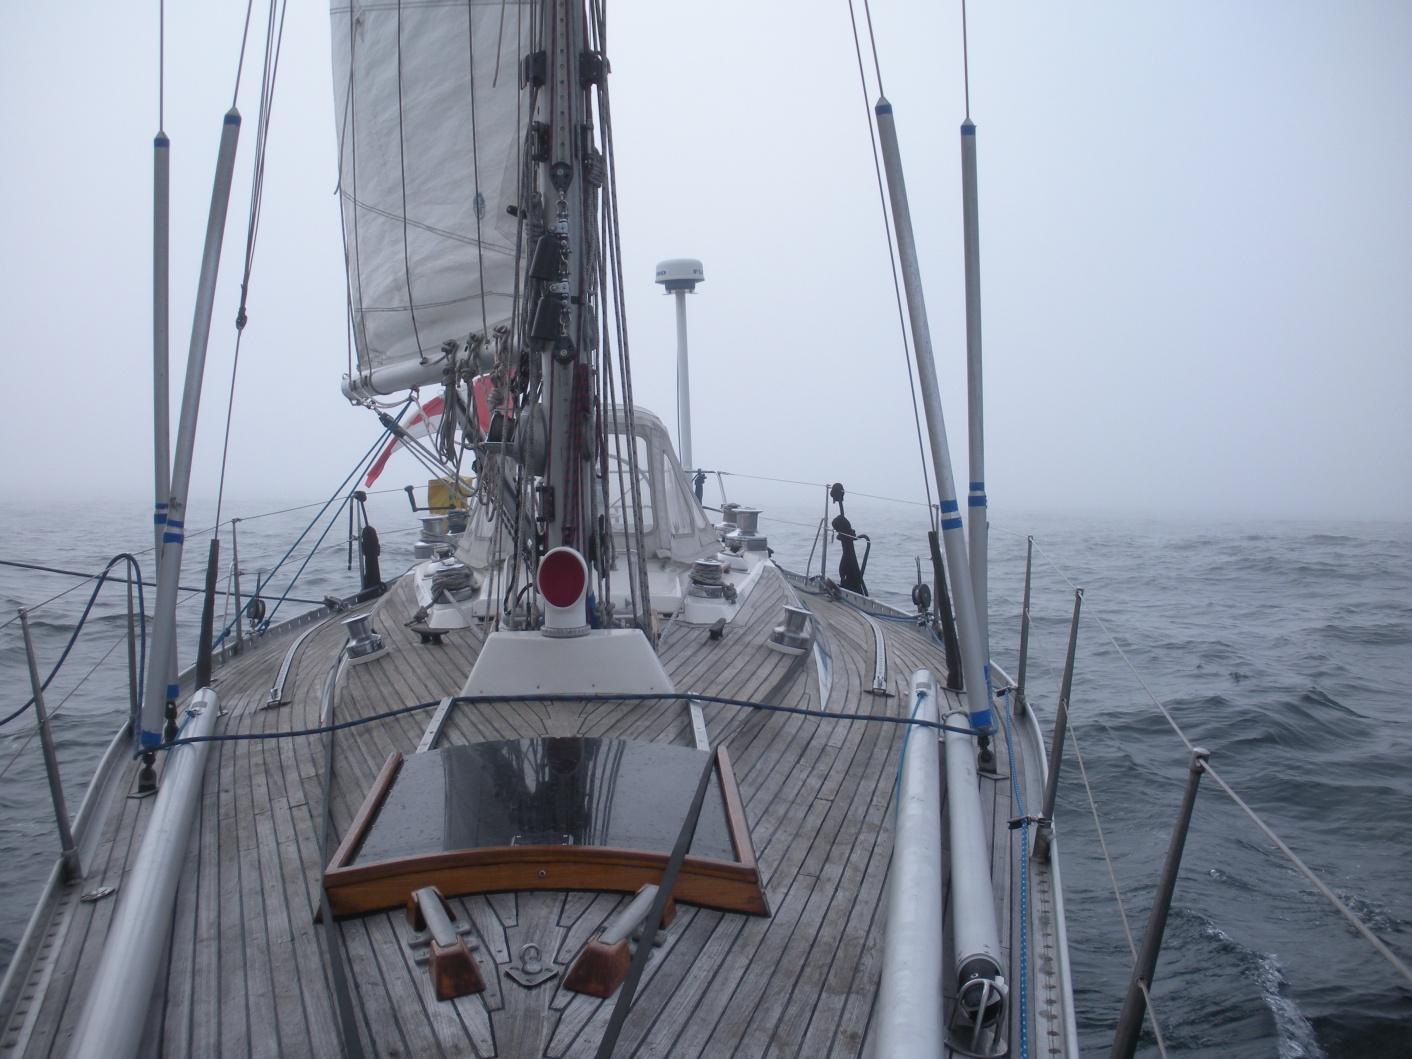 Click image for larger version  Name:Circumnav 2009 (6).jpg Views:309 Size:413.1 KB ID:30656